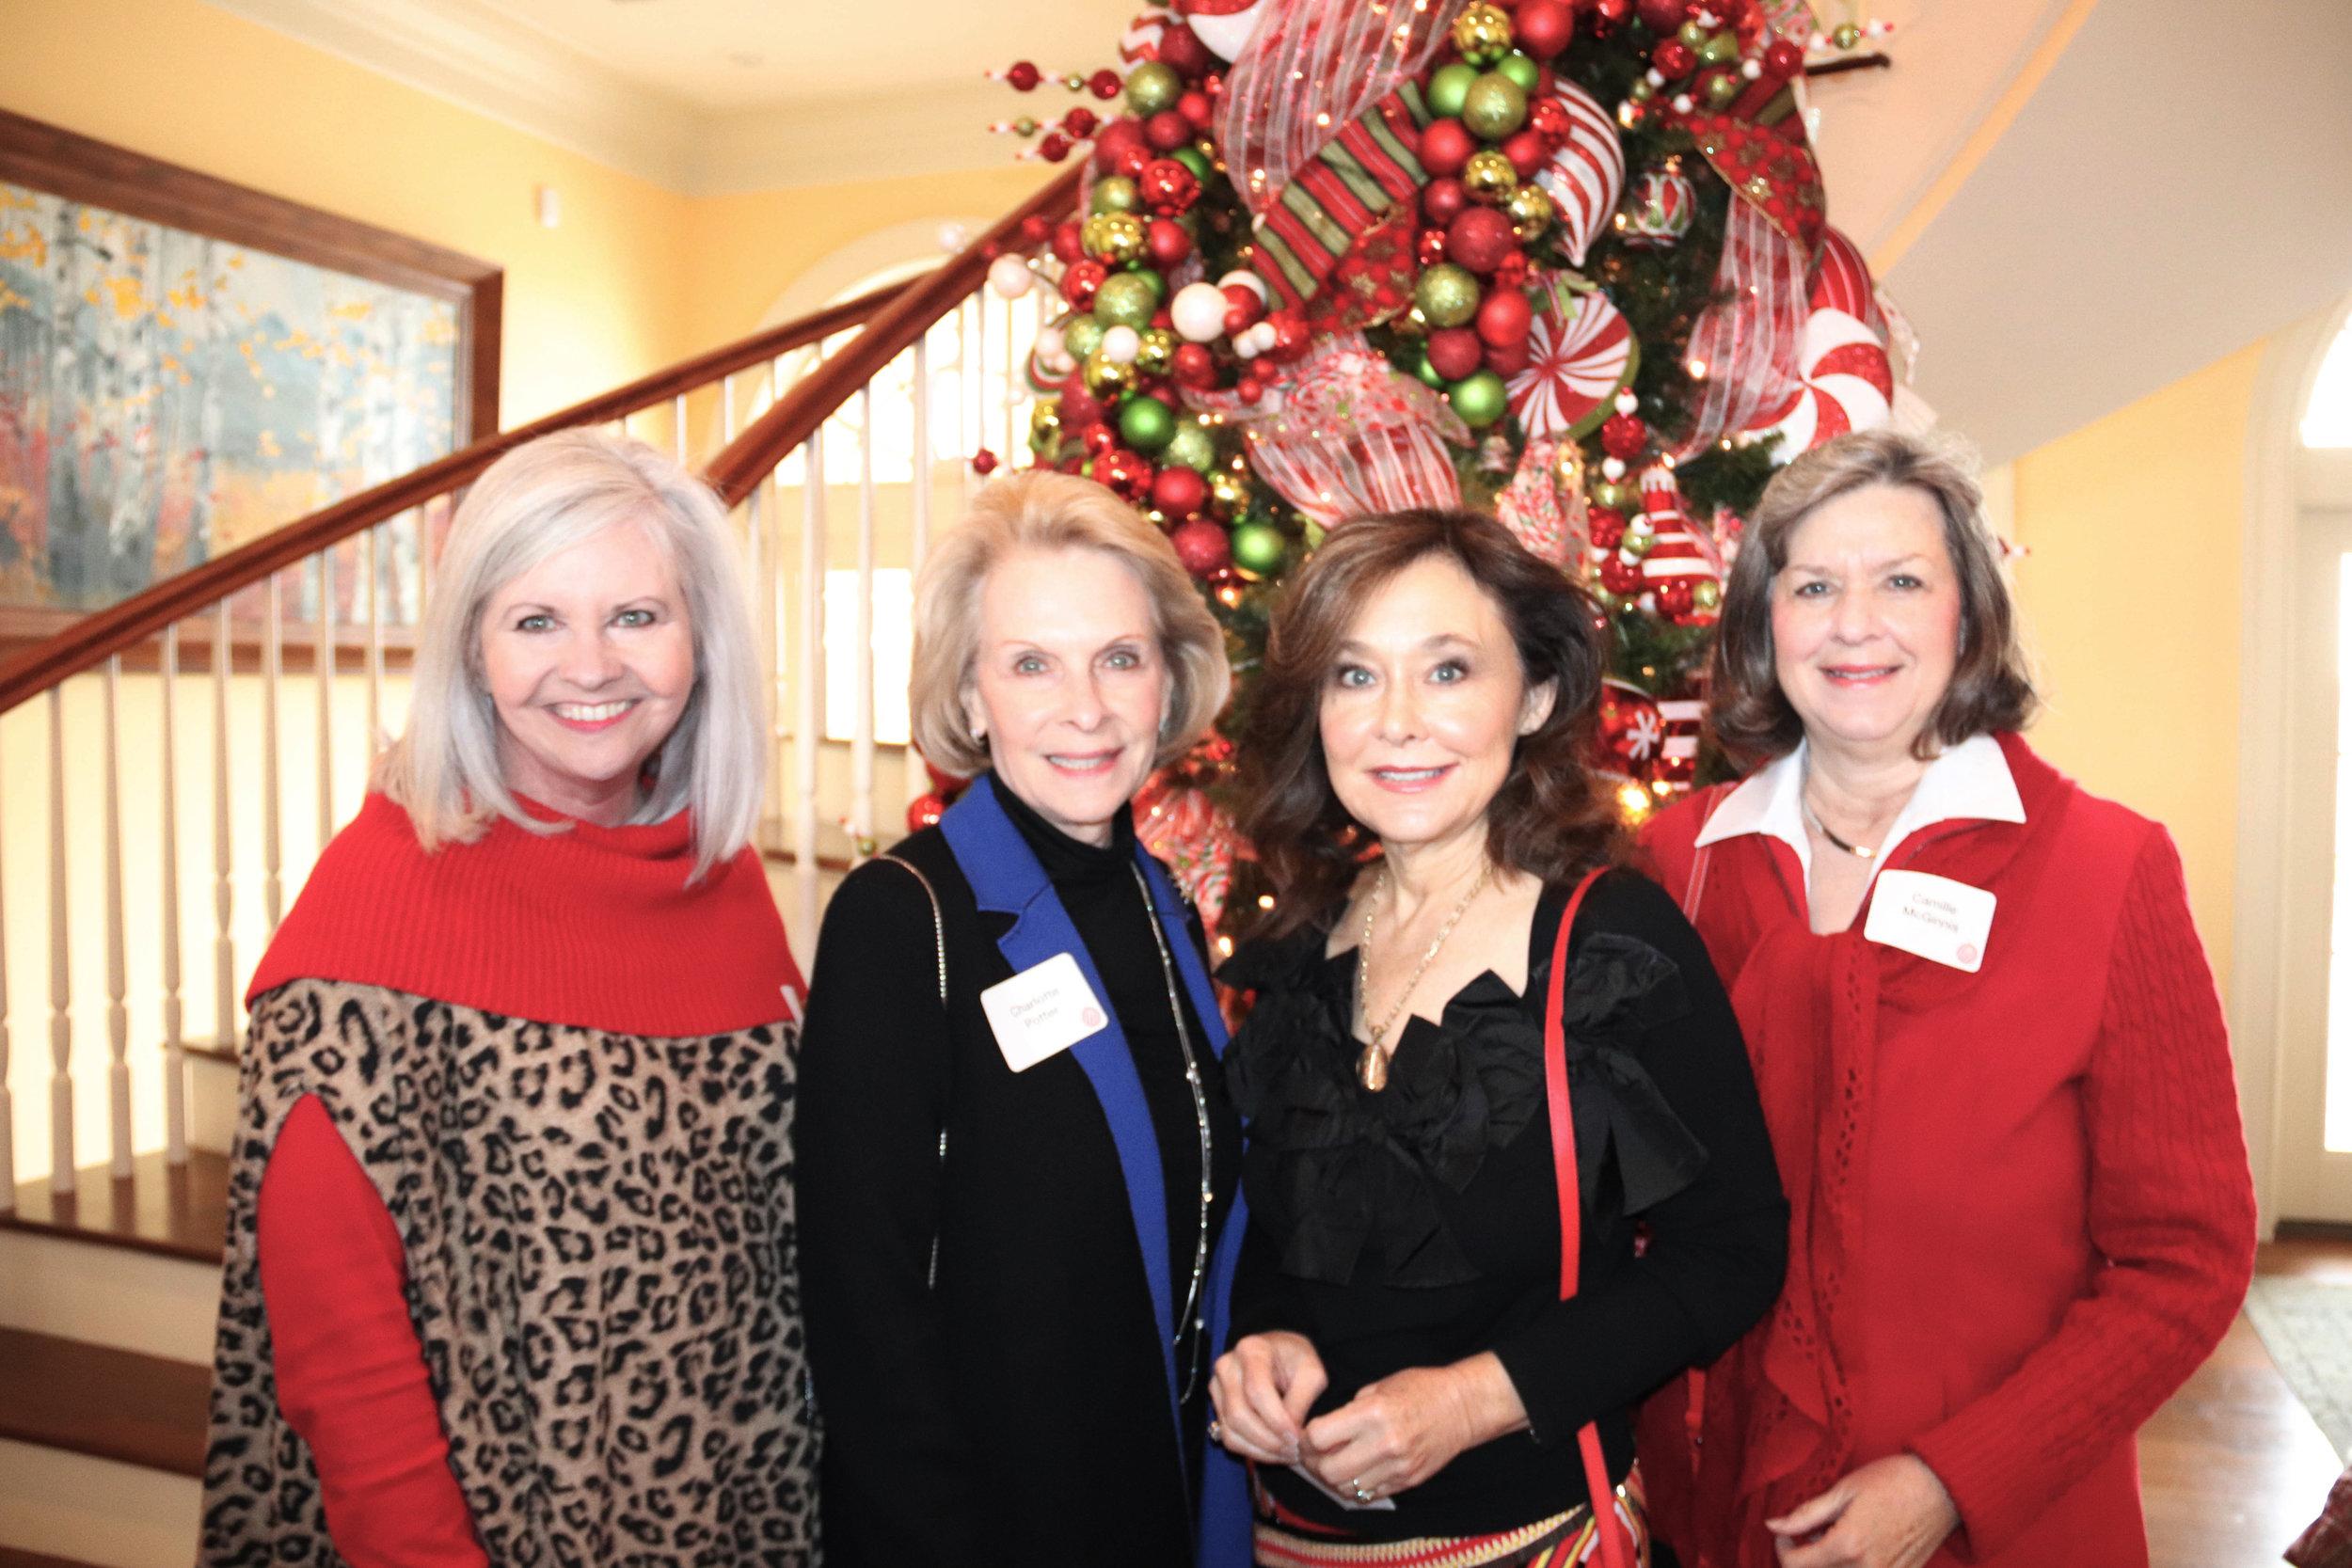 Hon. Sherry Jackson Hawkins, Charlotte Potter, Becky Stuart and Camille McGinnis